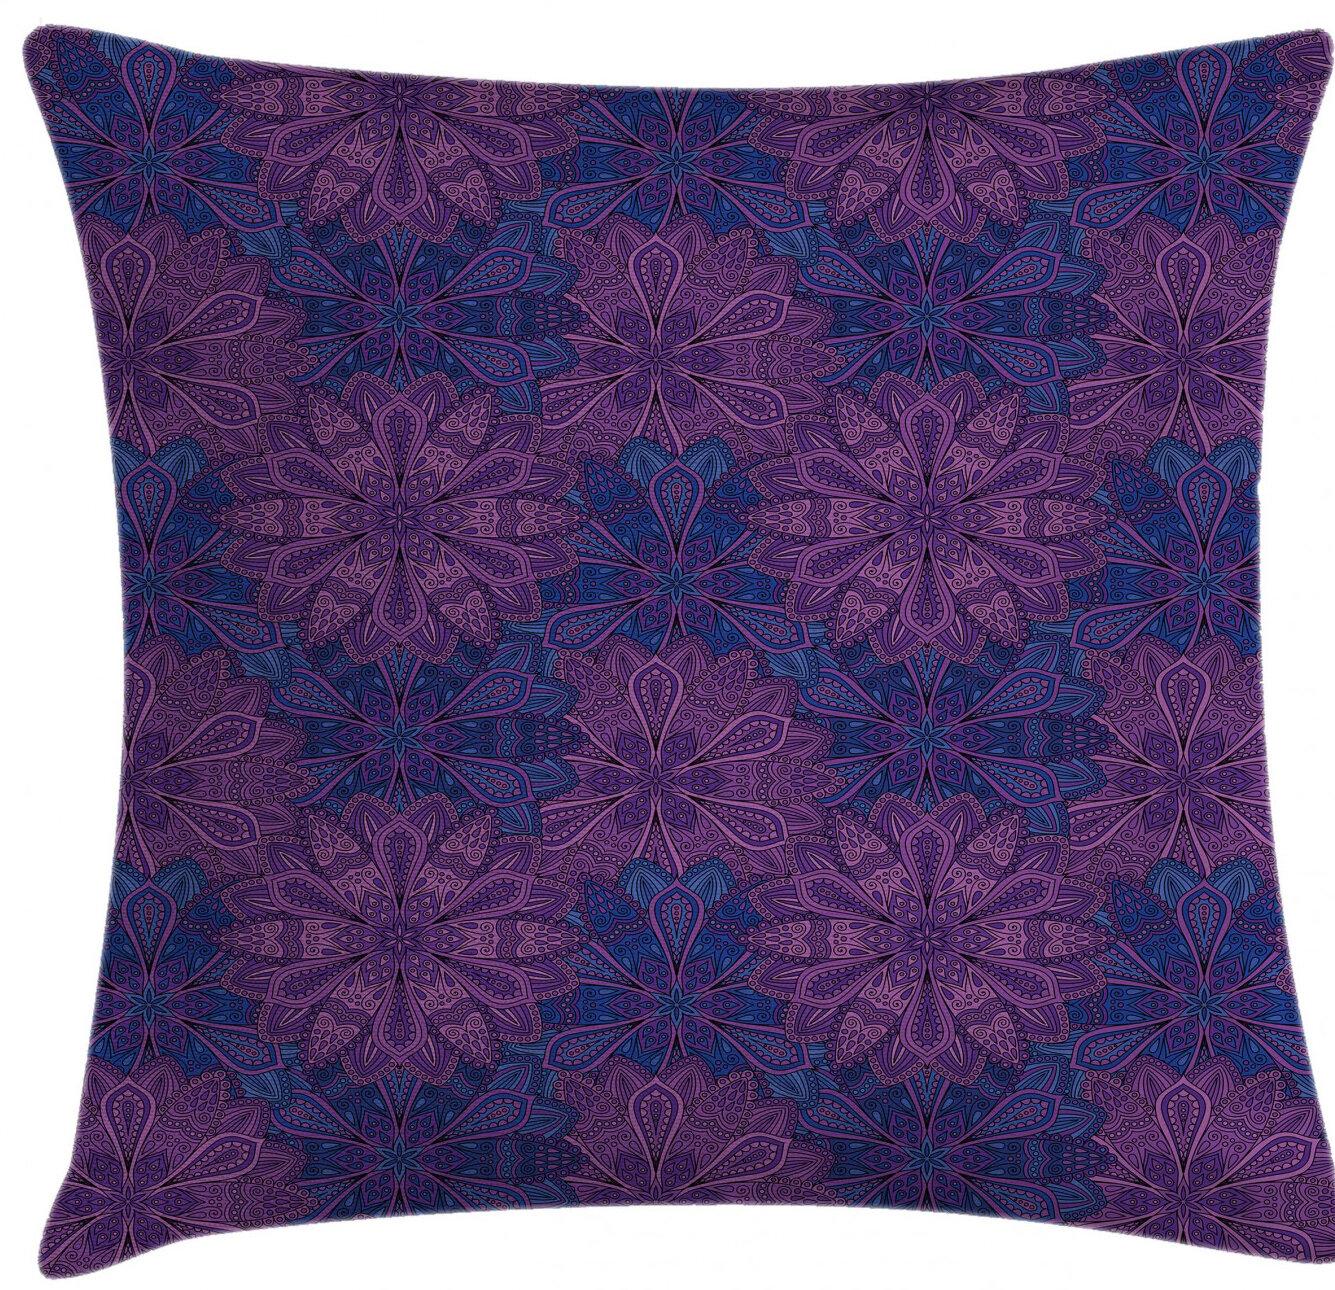 East Urban Home Indoor Outdoor Damask 26 Throw Pillow Cover Wayfair